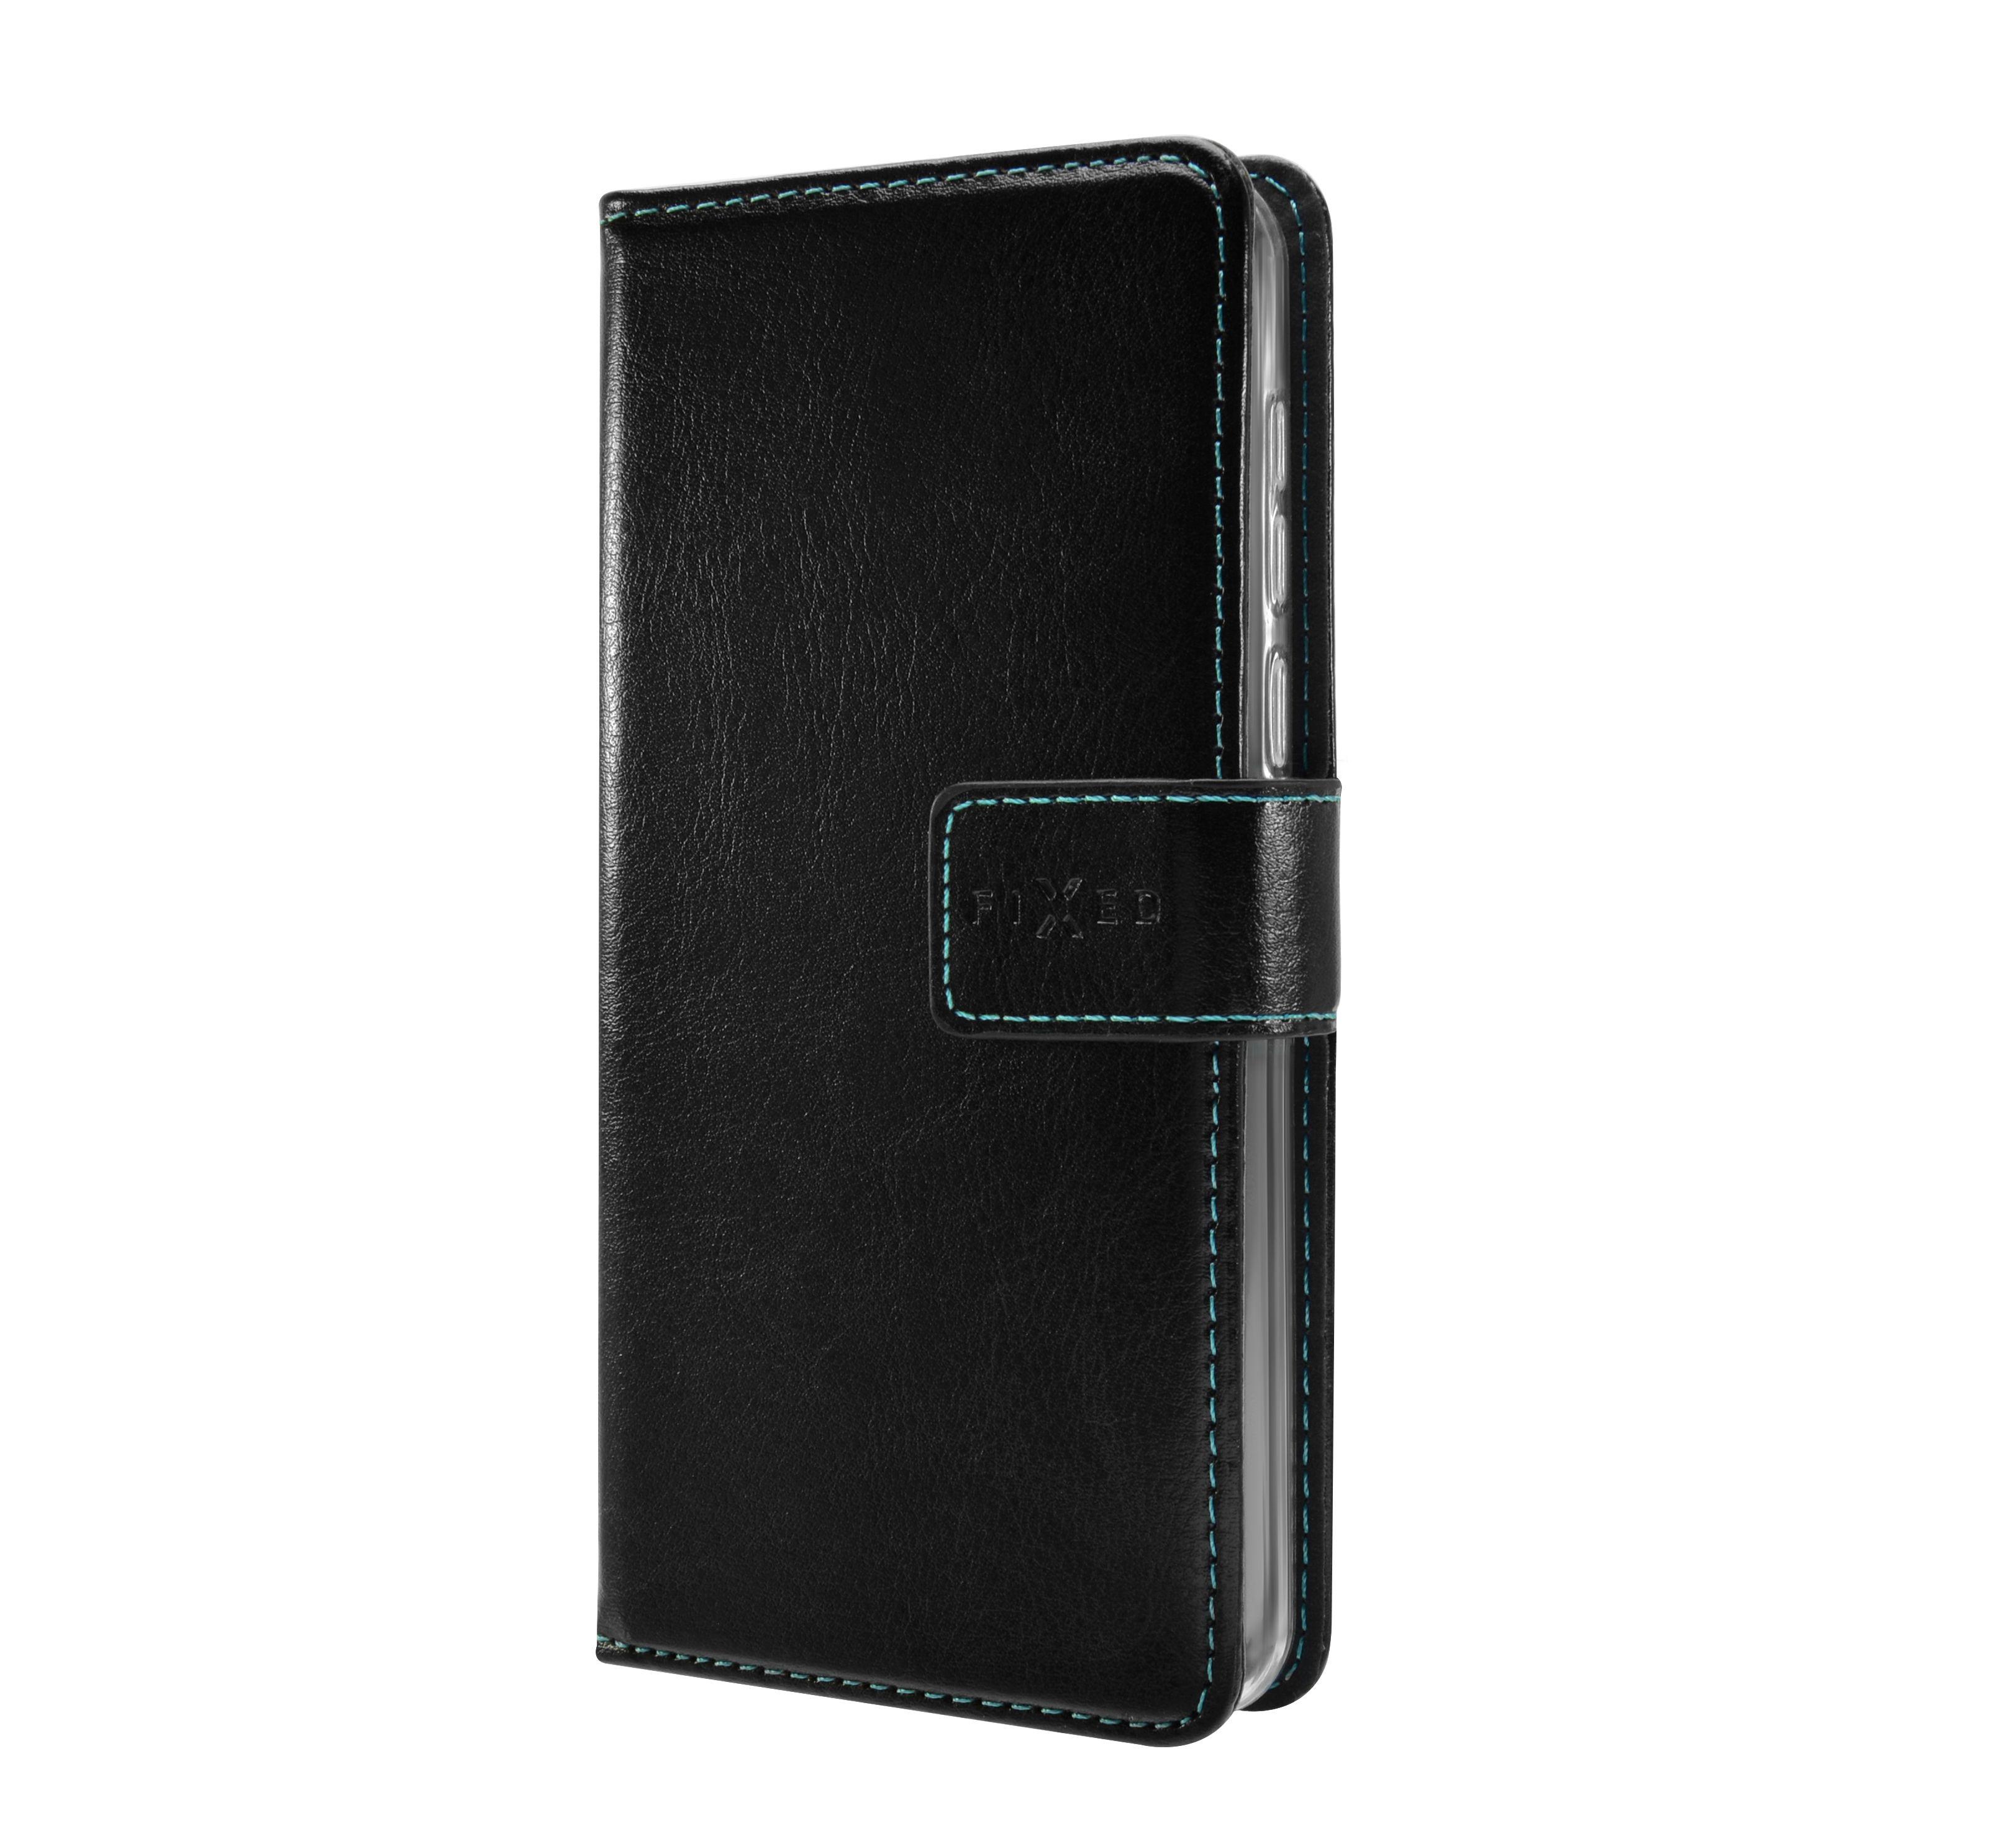 Pouzdro typu kniha FIXED Opus pro Huawei Y9 Prime (2019), černé